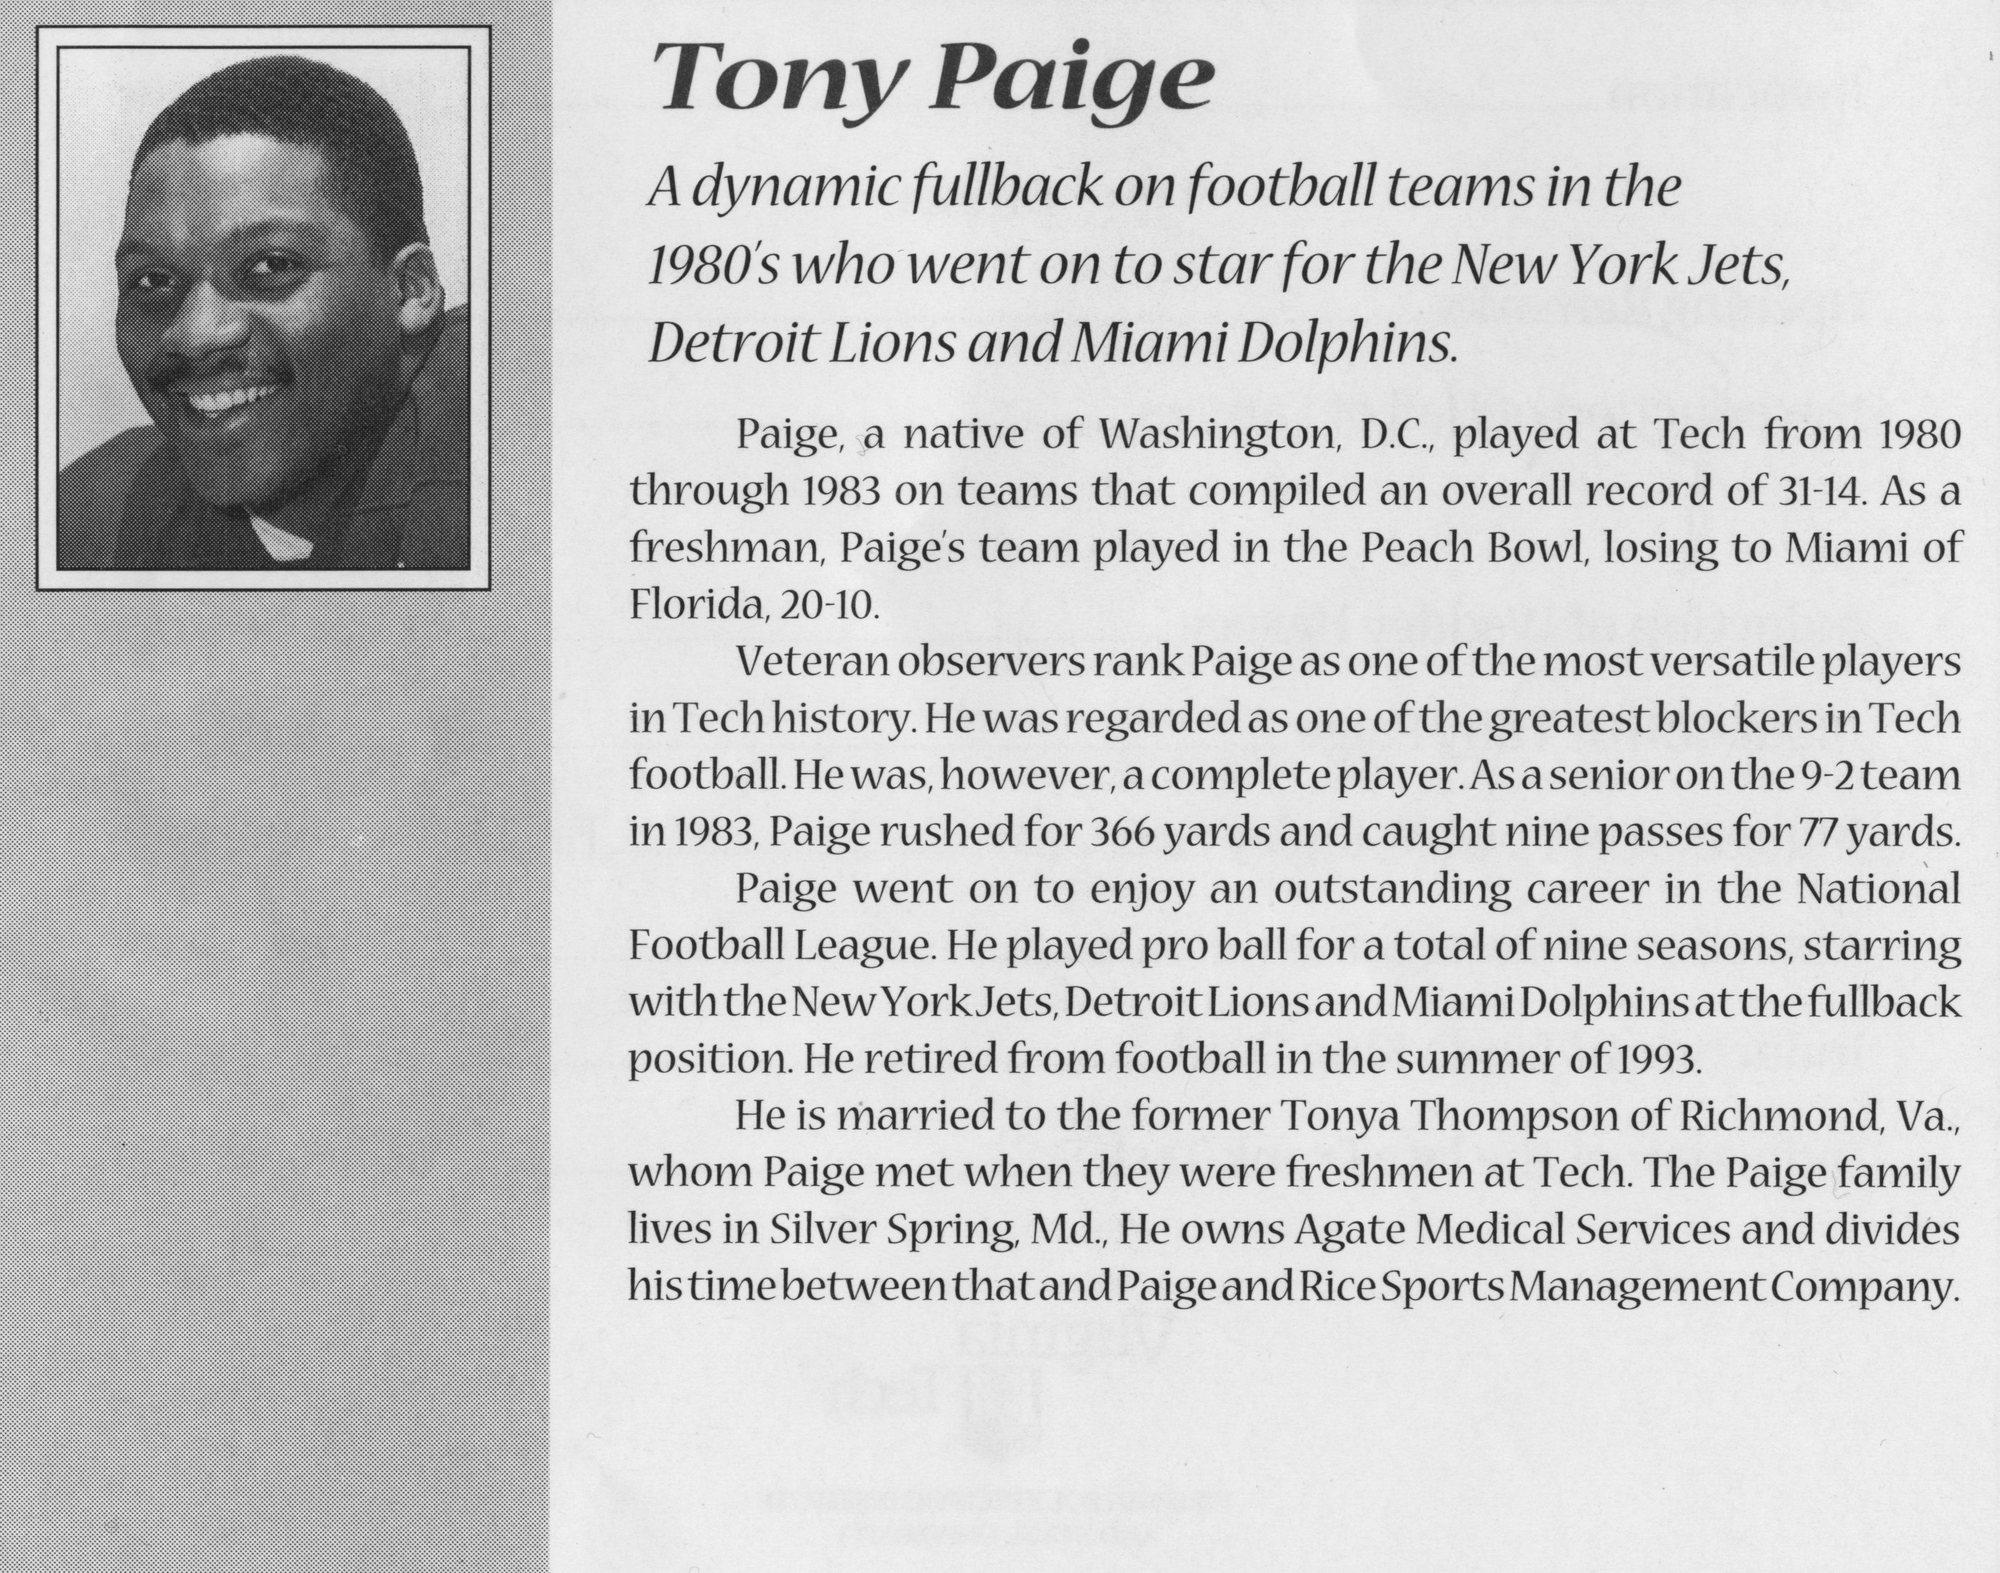 http://spec.lib.vt.edu/pickup/Omeka_upload/PaigeTony_1995.jpg